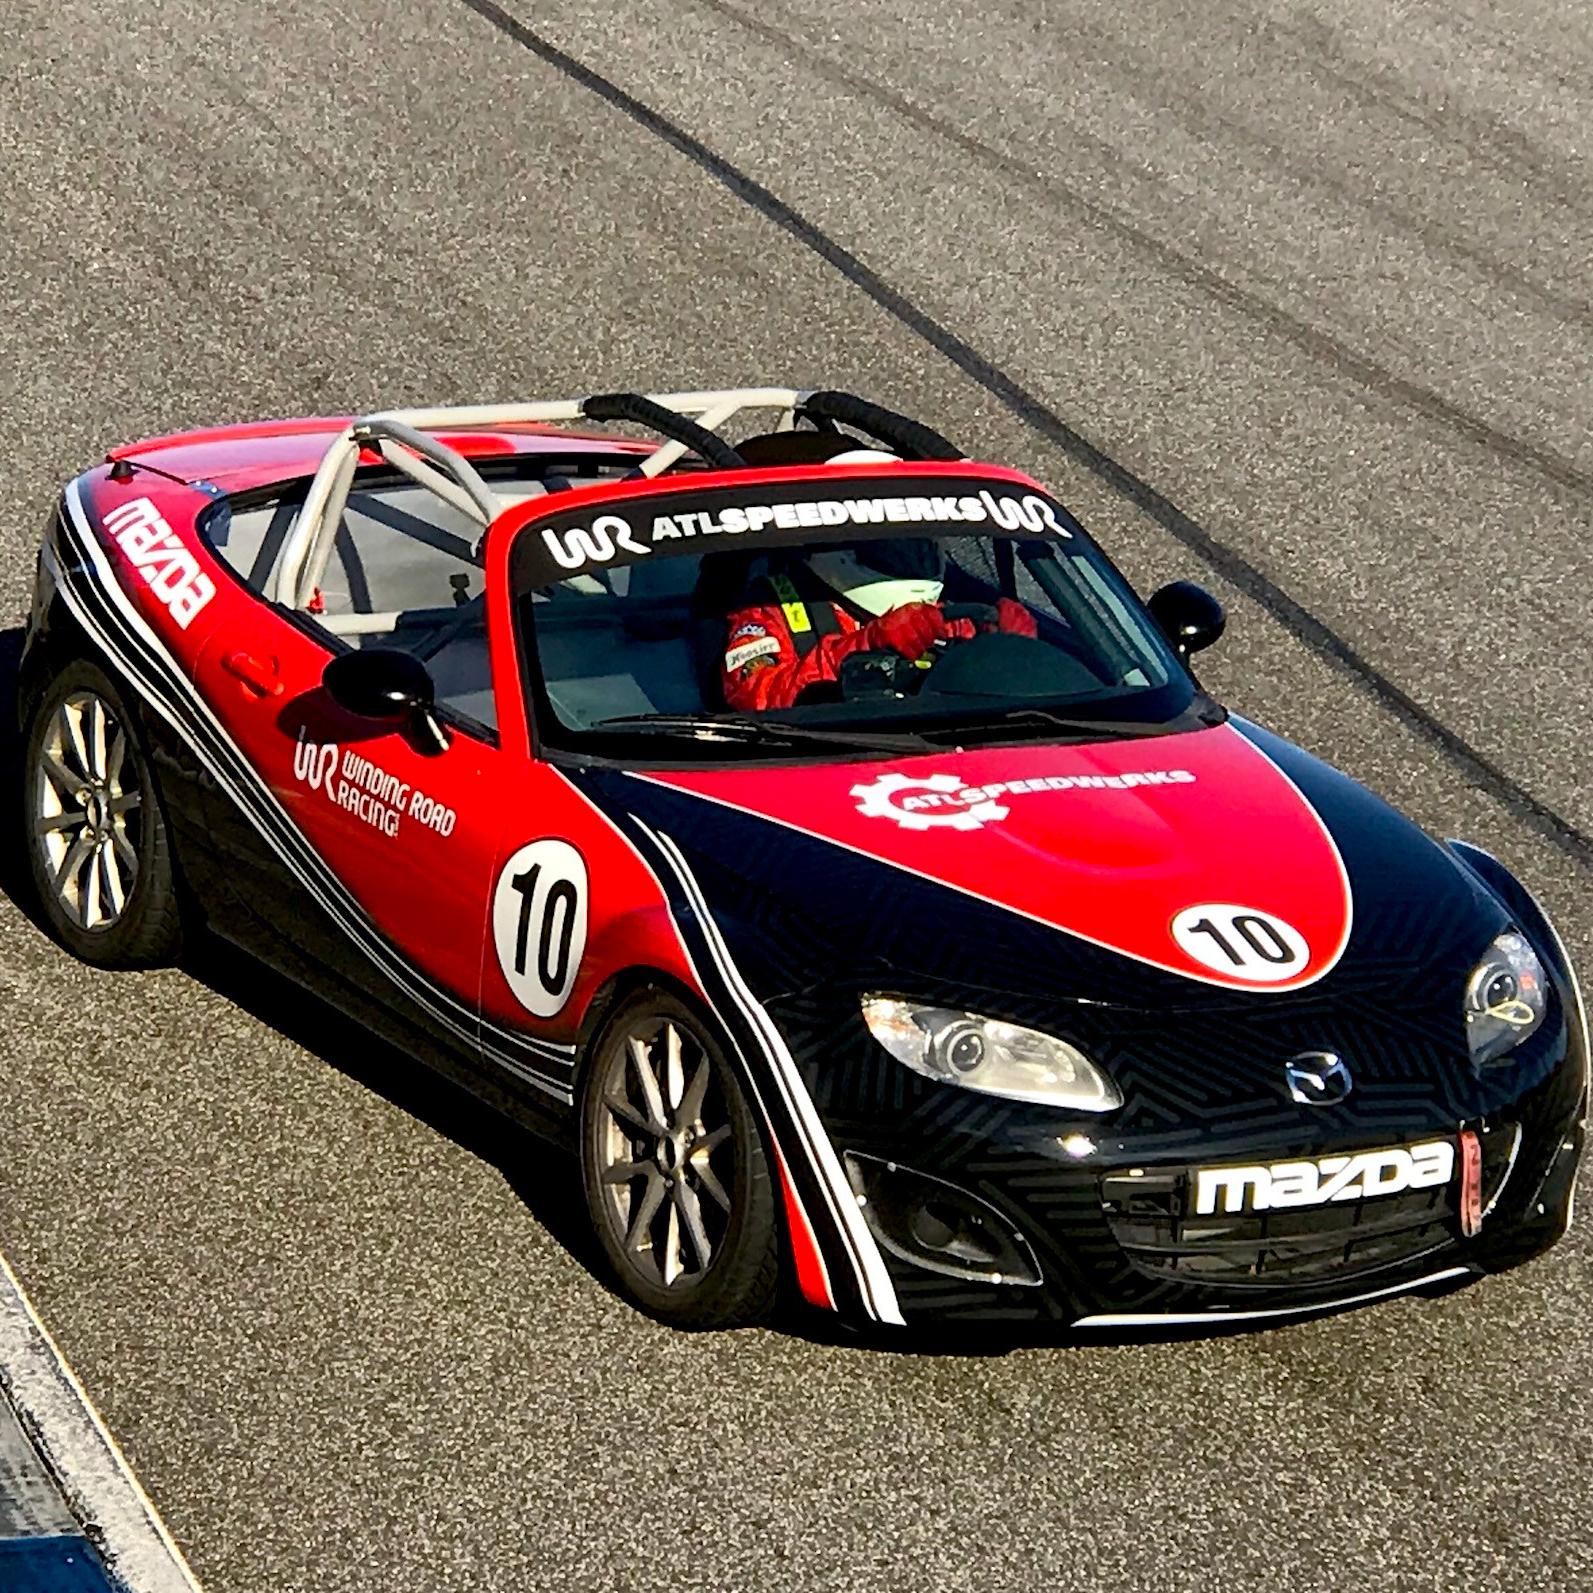 Spec MX-5 Race Cars – SPEC MX-5